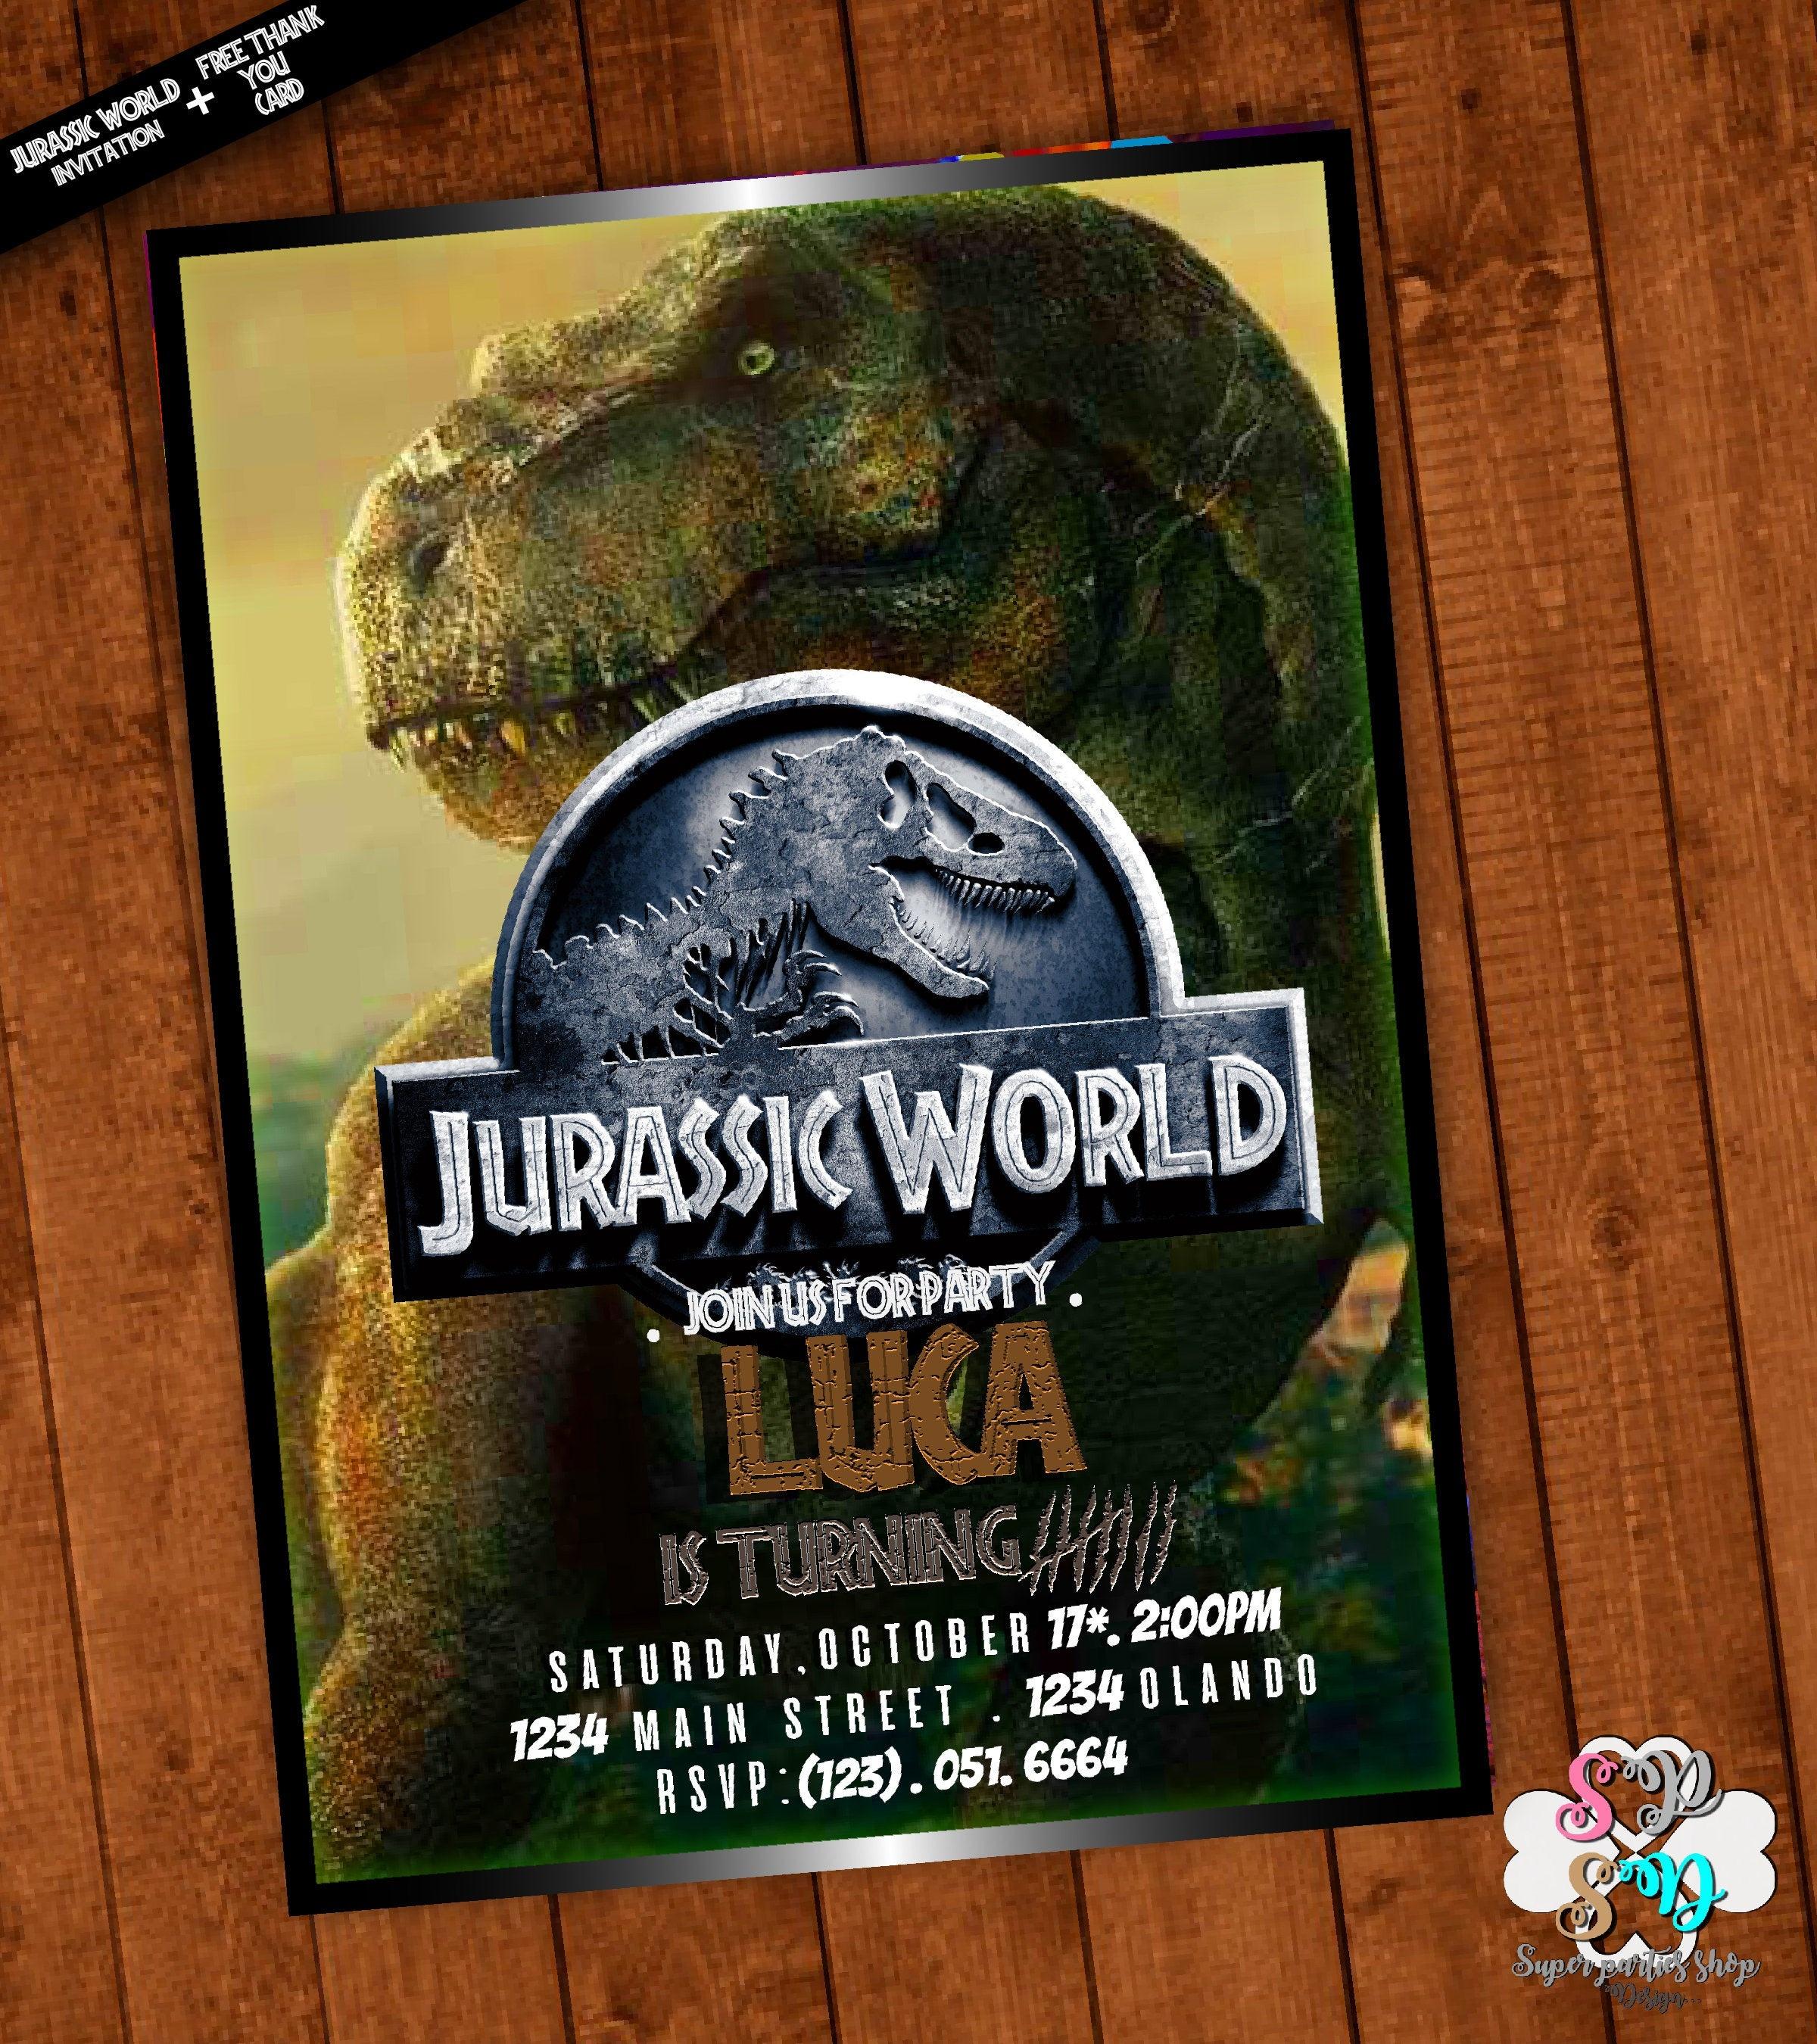 Jurassic World Invitation Printable With Free Thank You Card | Etsy - Free Printable Jurassic Park Invitations